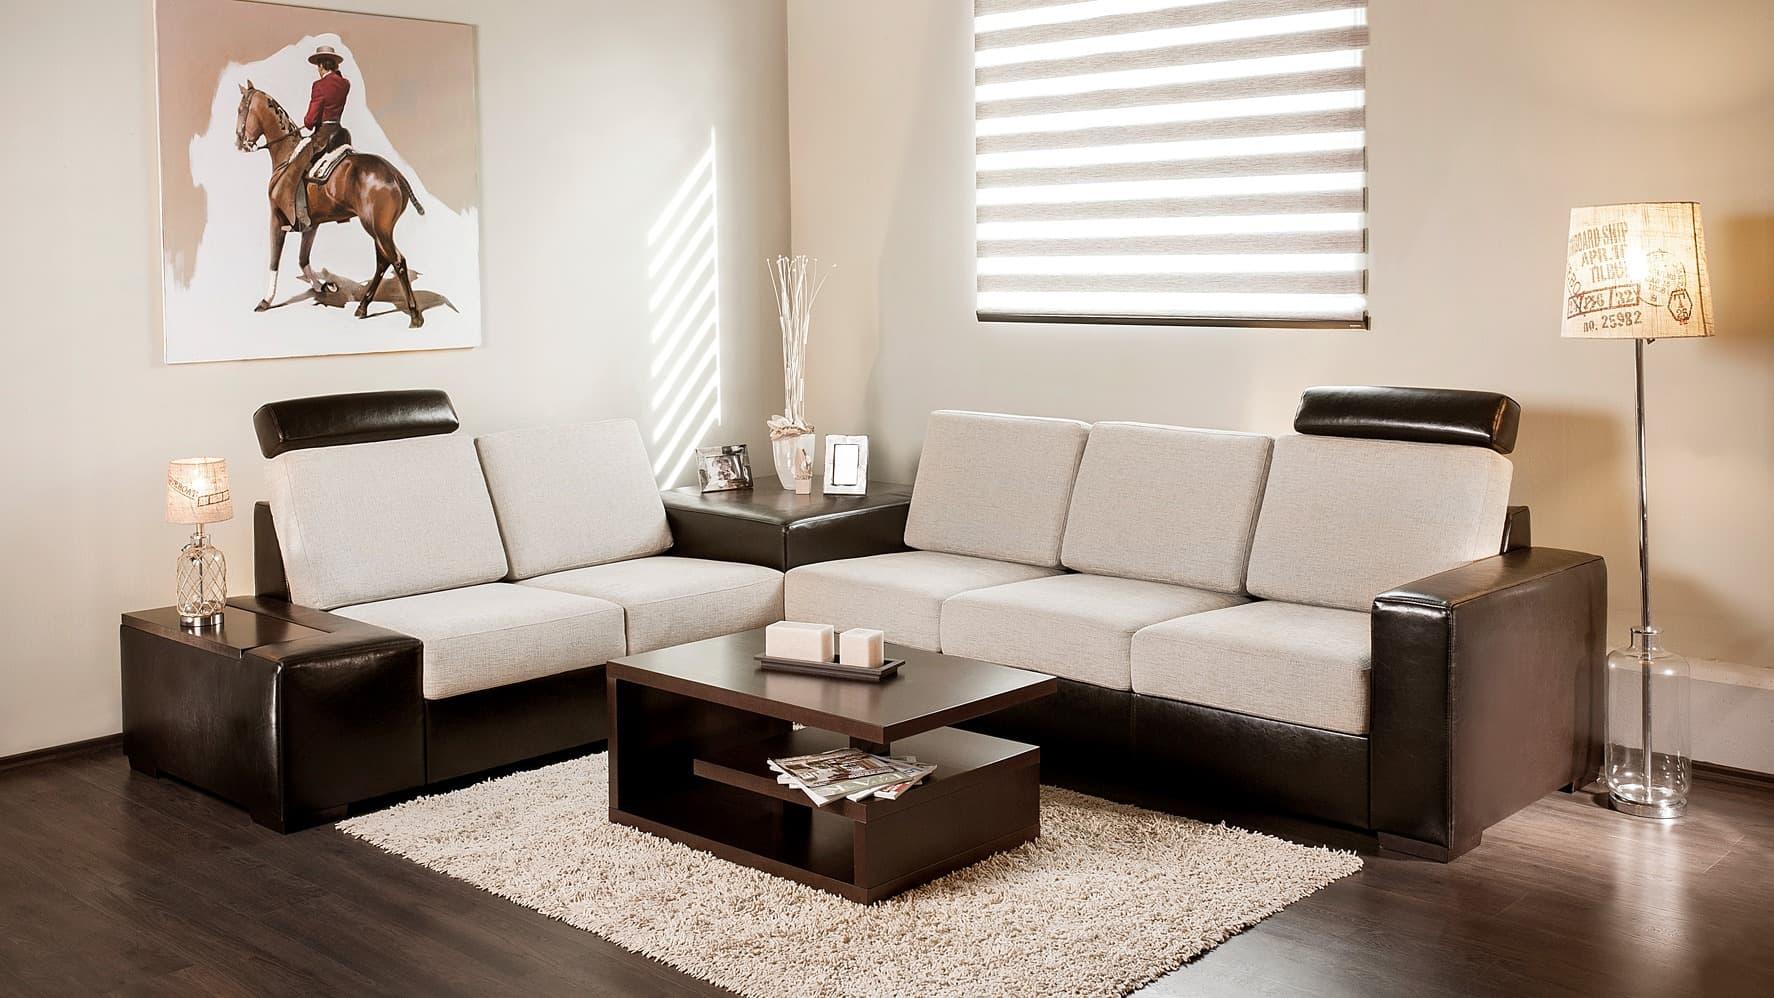 City kanapé sarokasztallal